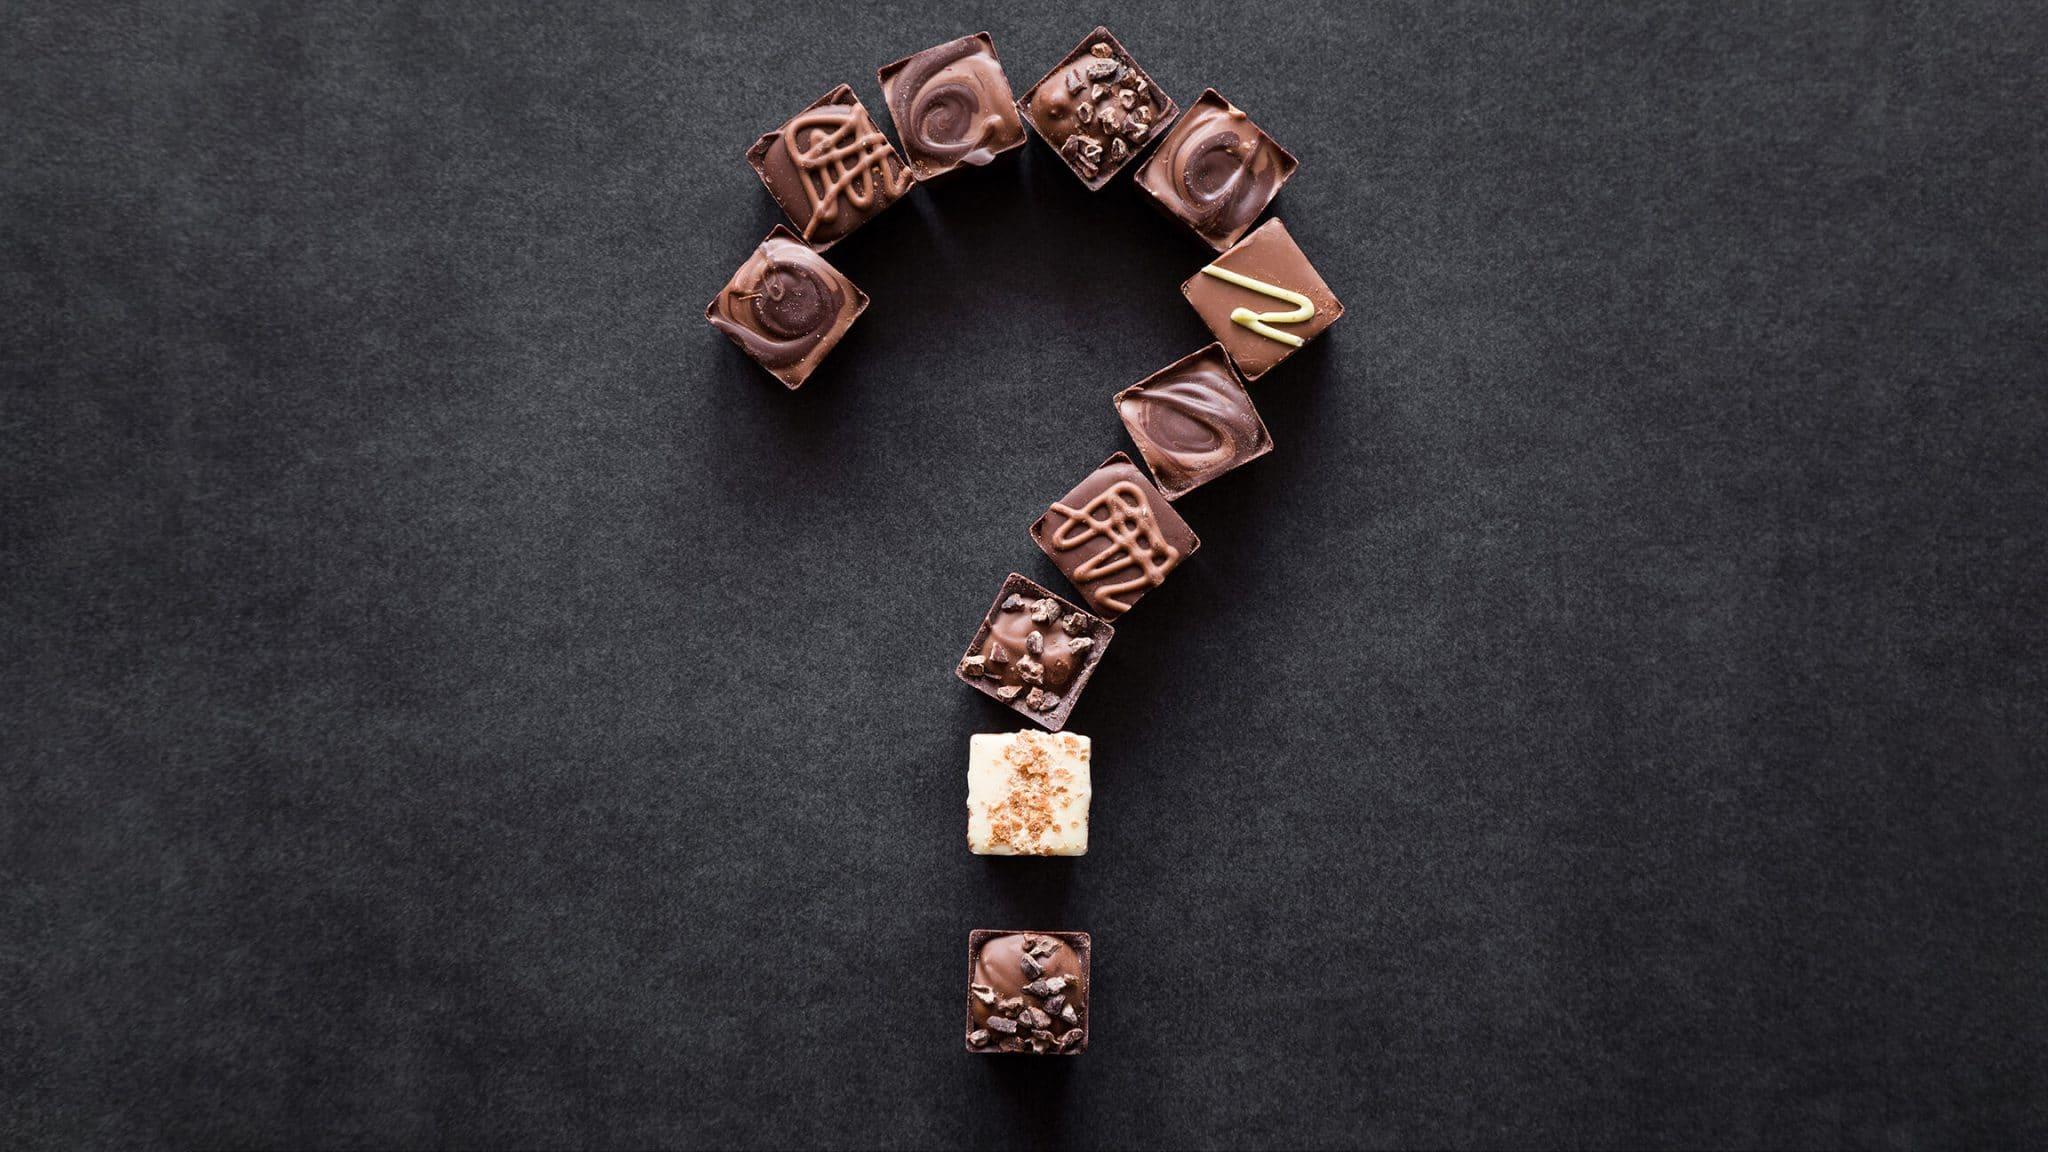 chocolat test de produits trnd 1 scaled